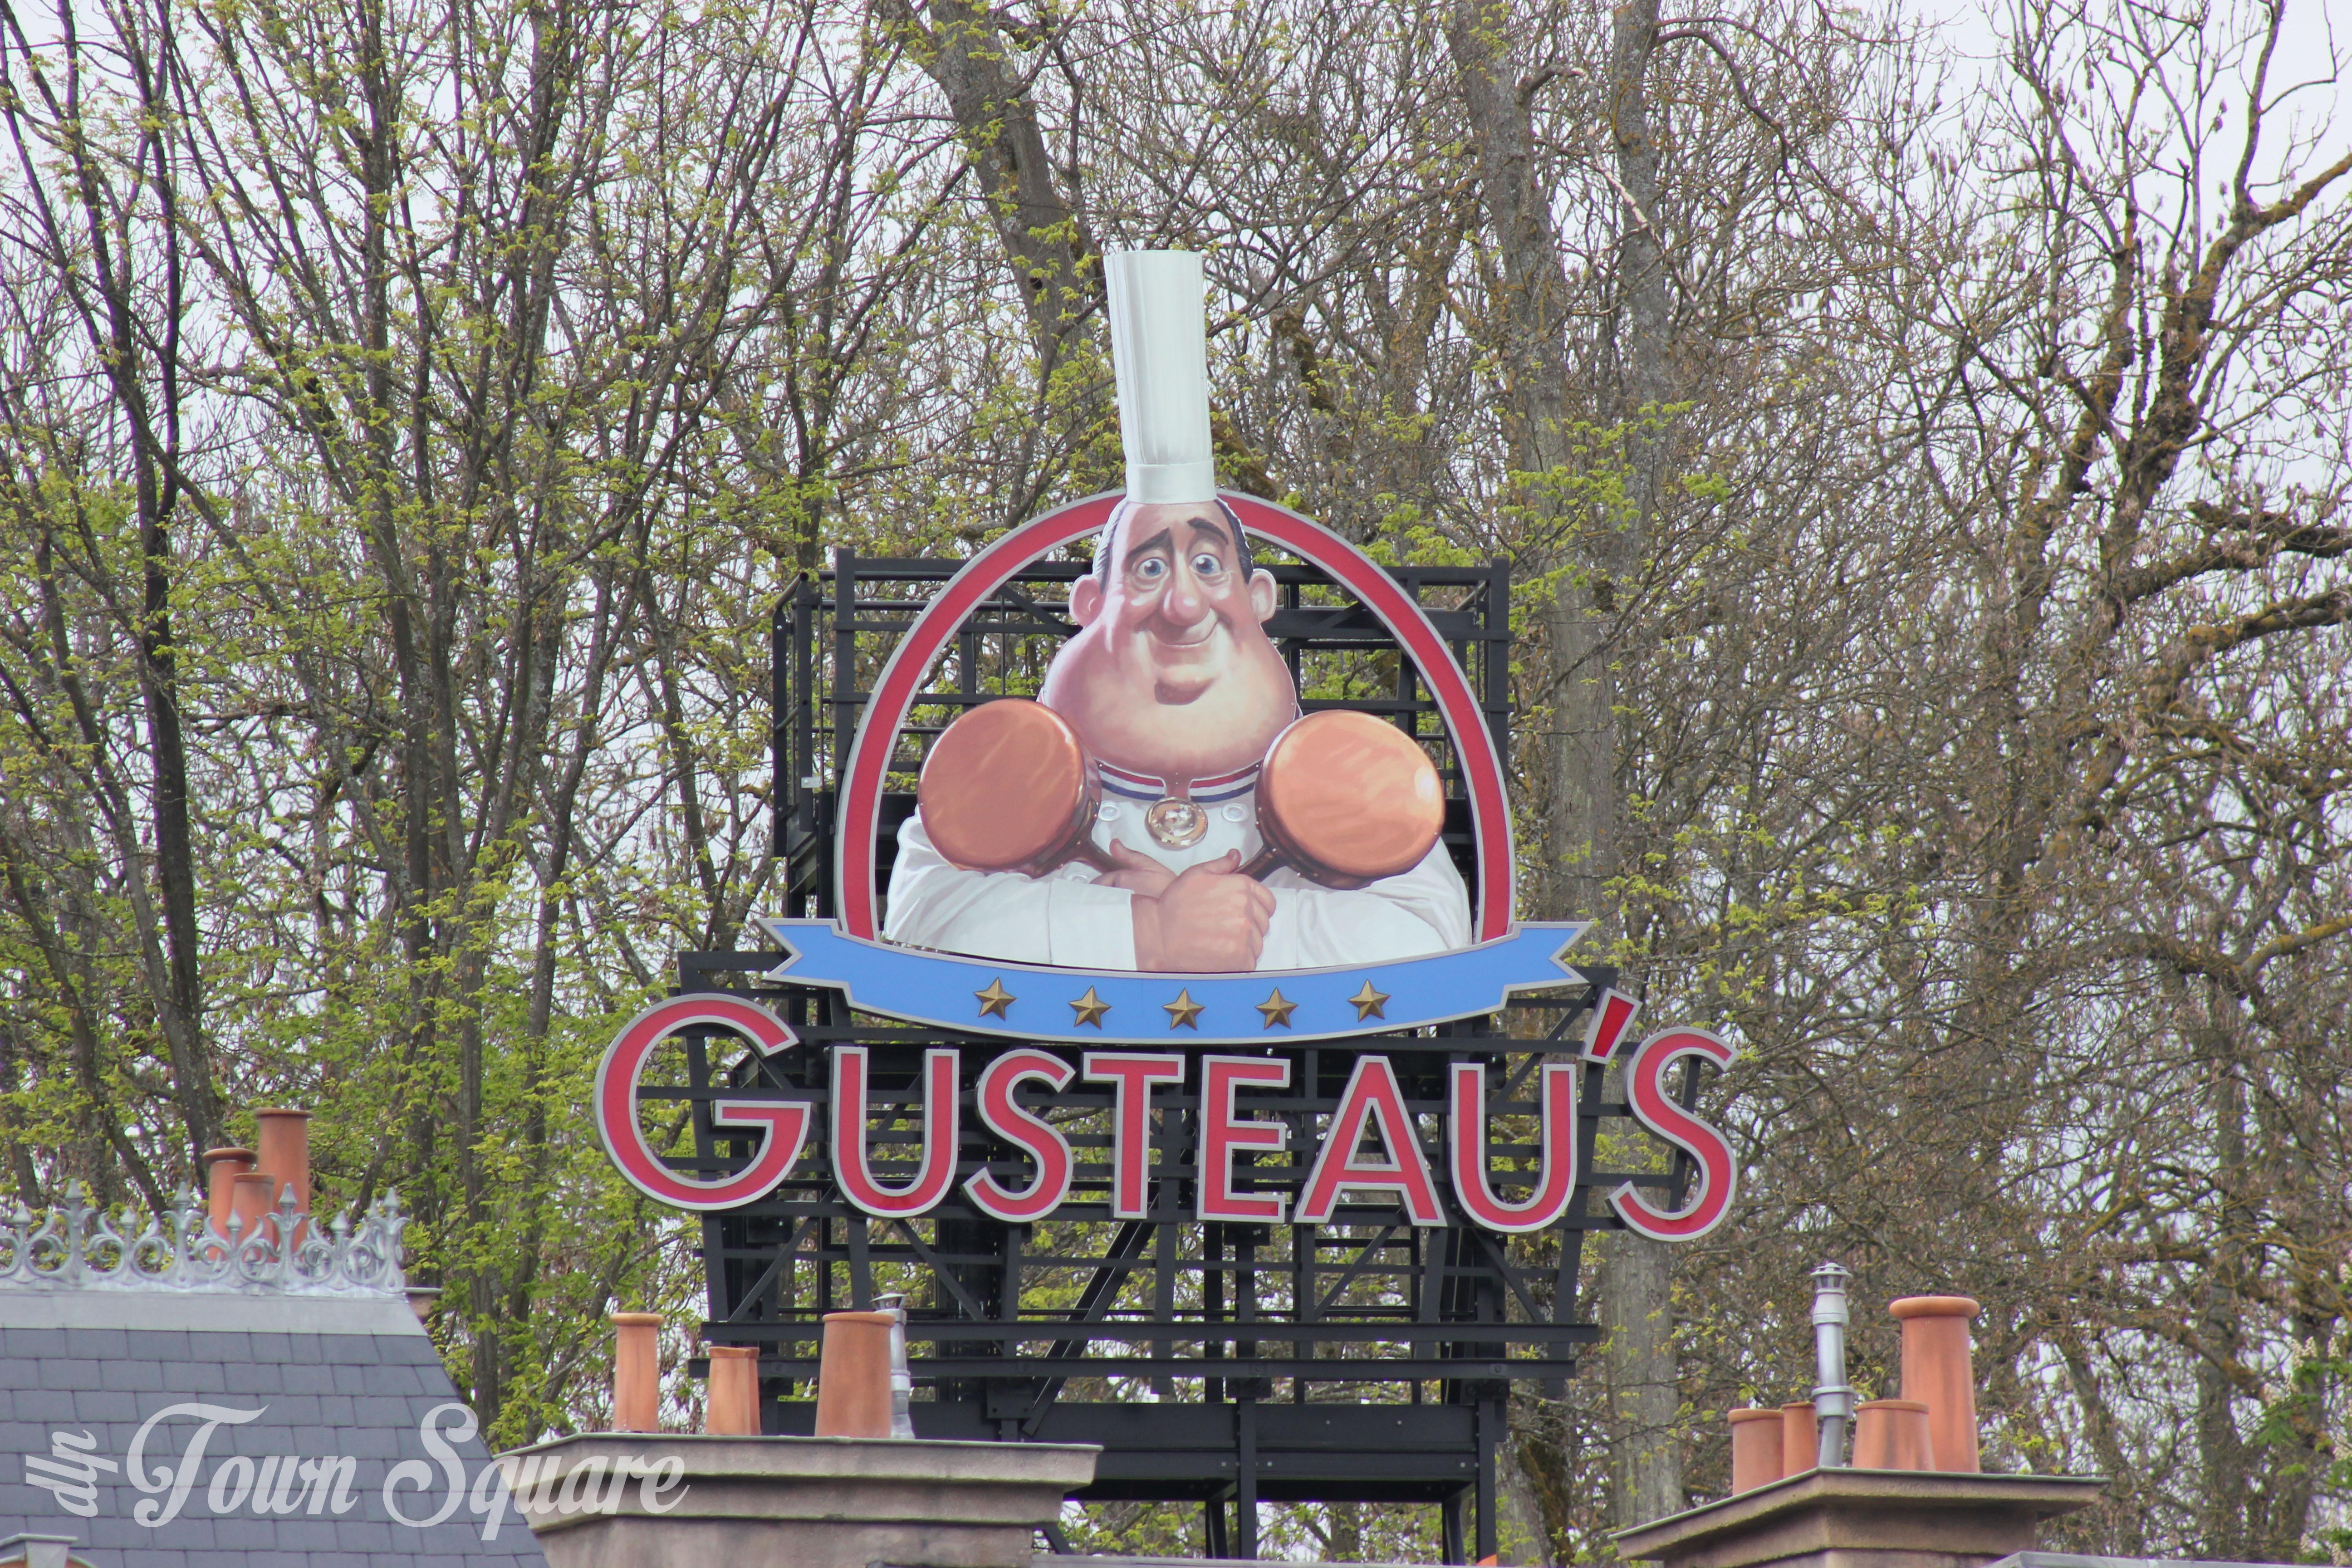 The Gusteau sign at Disneyland Paris Walt Disney Studios Park